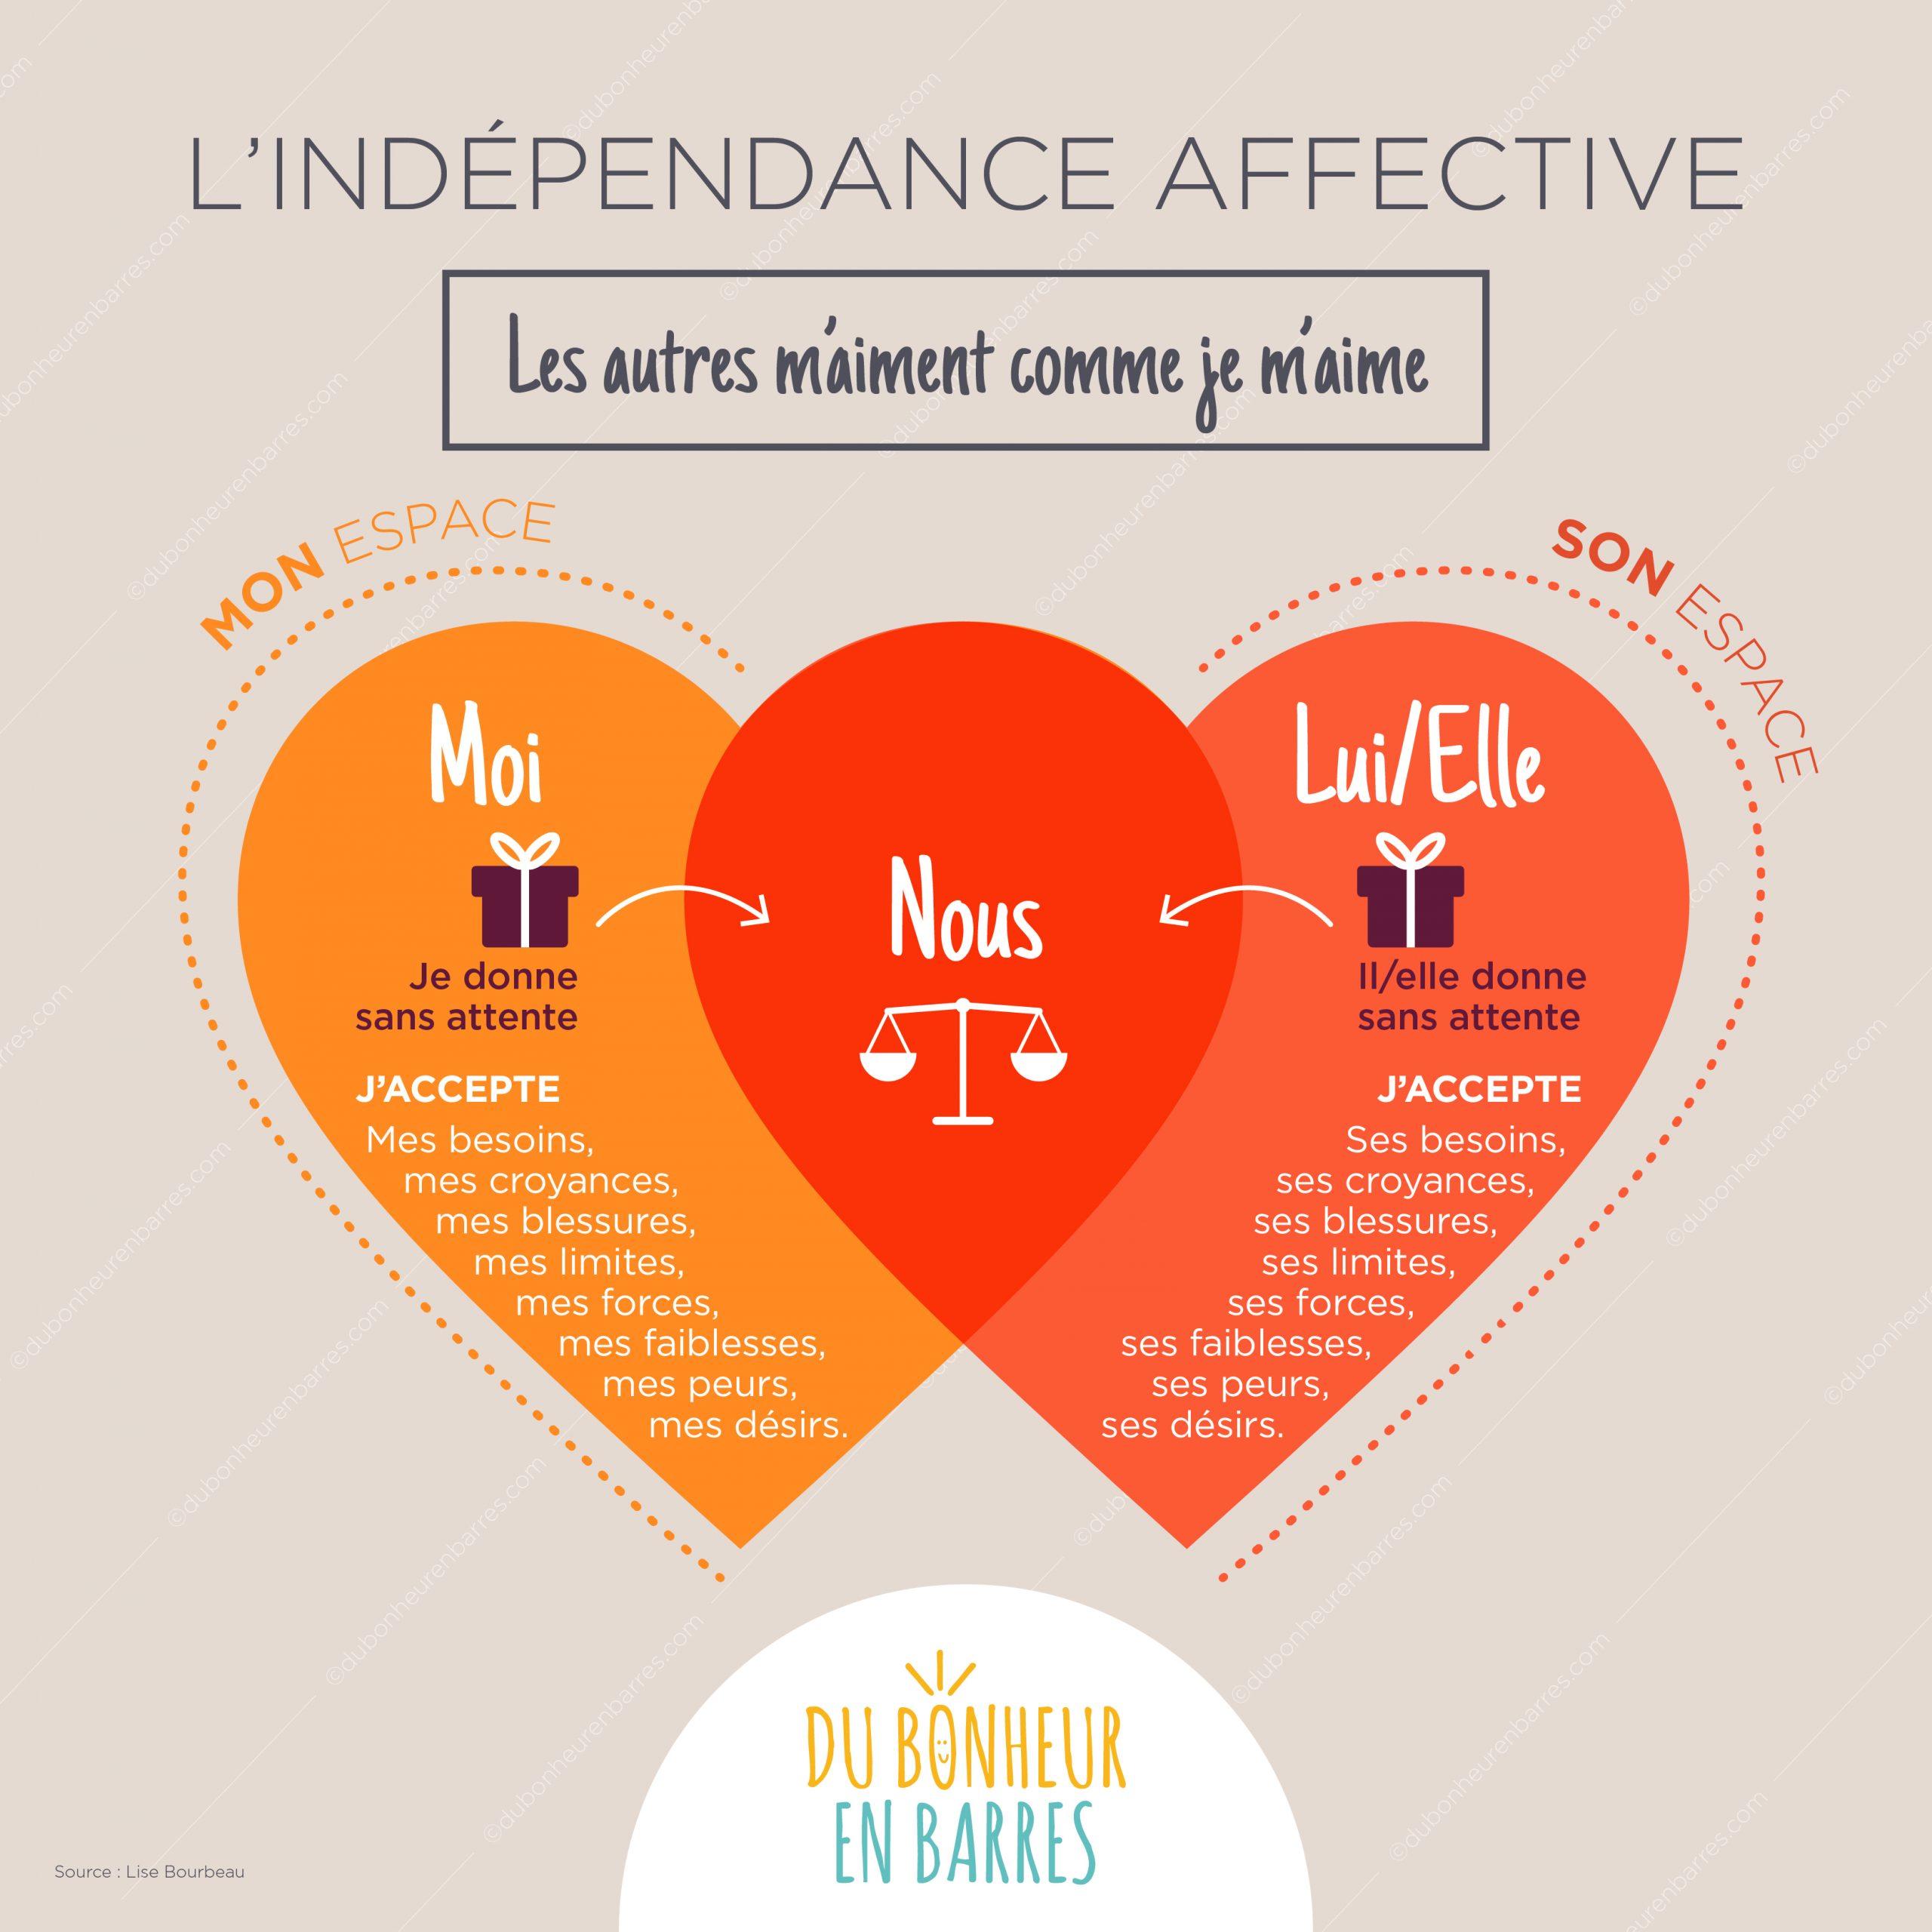 indépendance affective